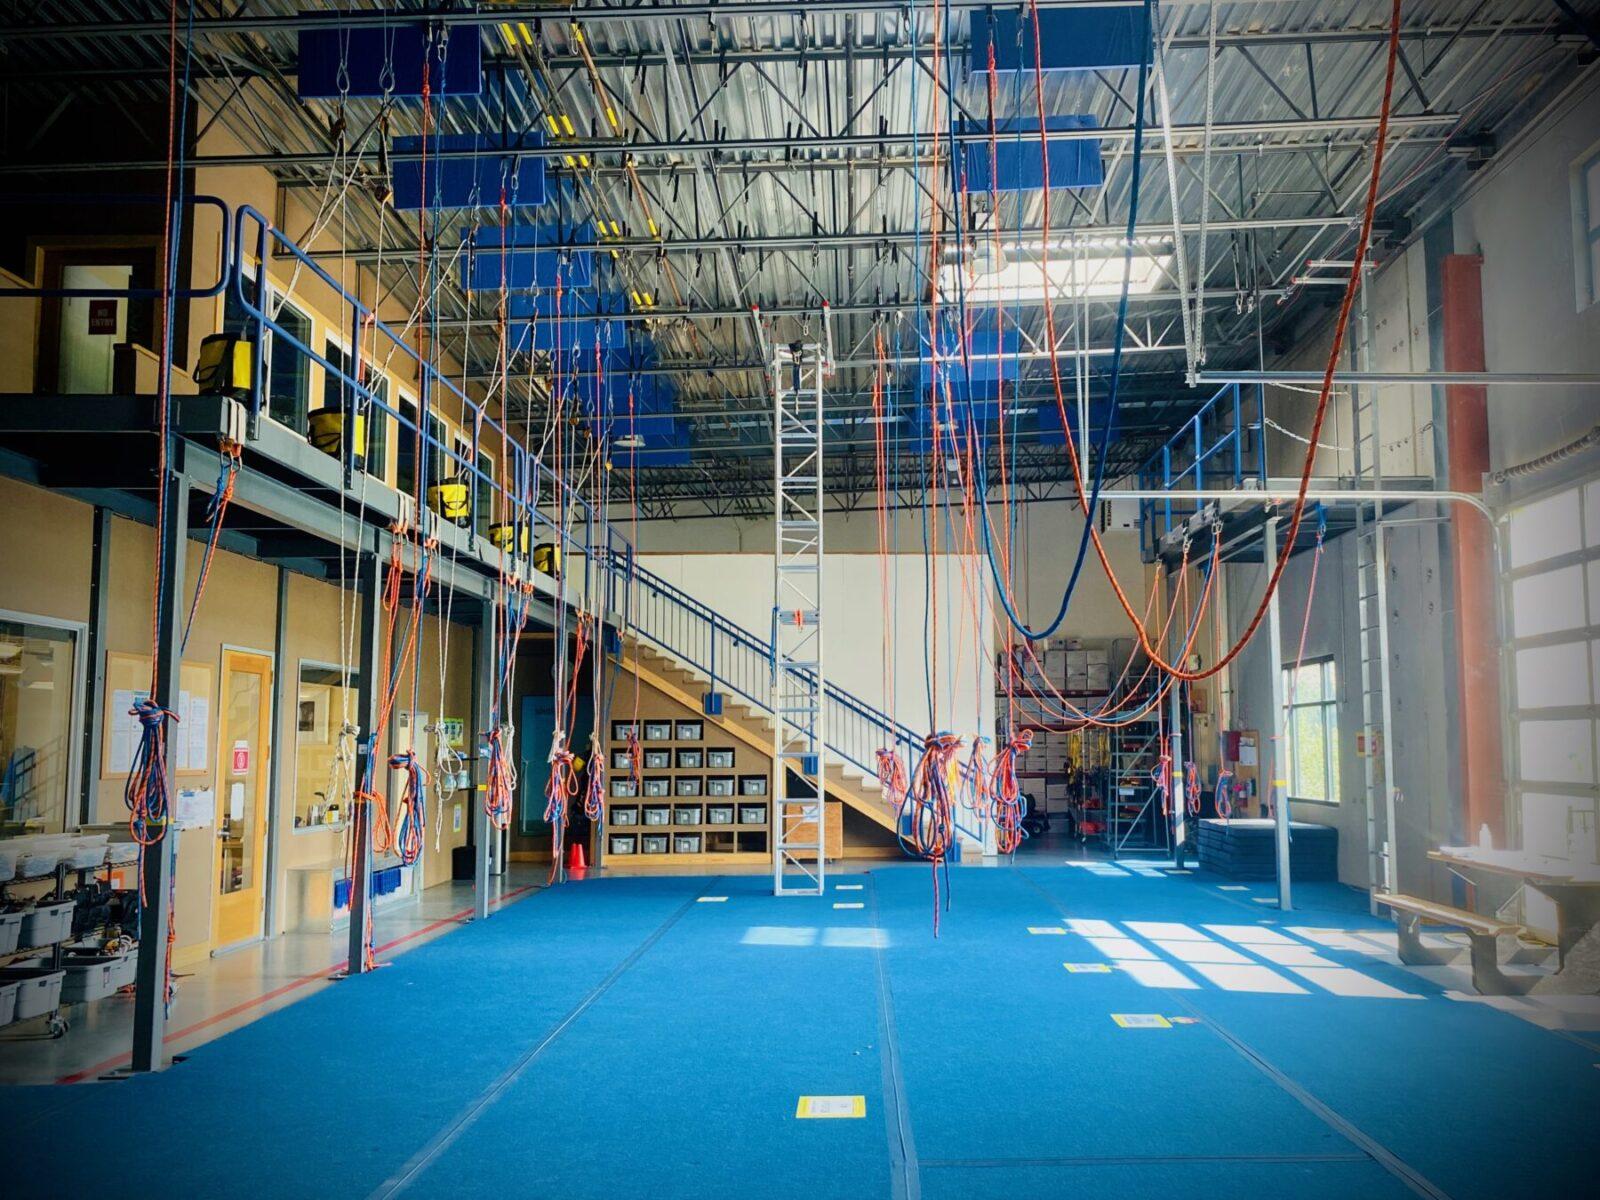 Petzl Technical Partner - MISTRAS/Ropeworks - indoor training facility